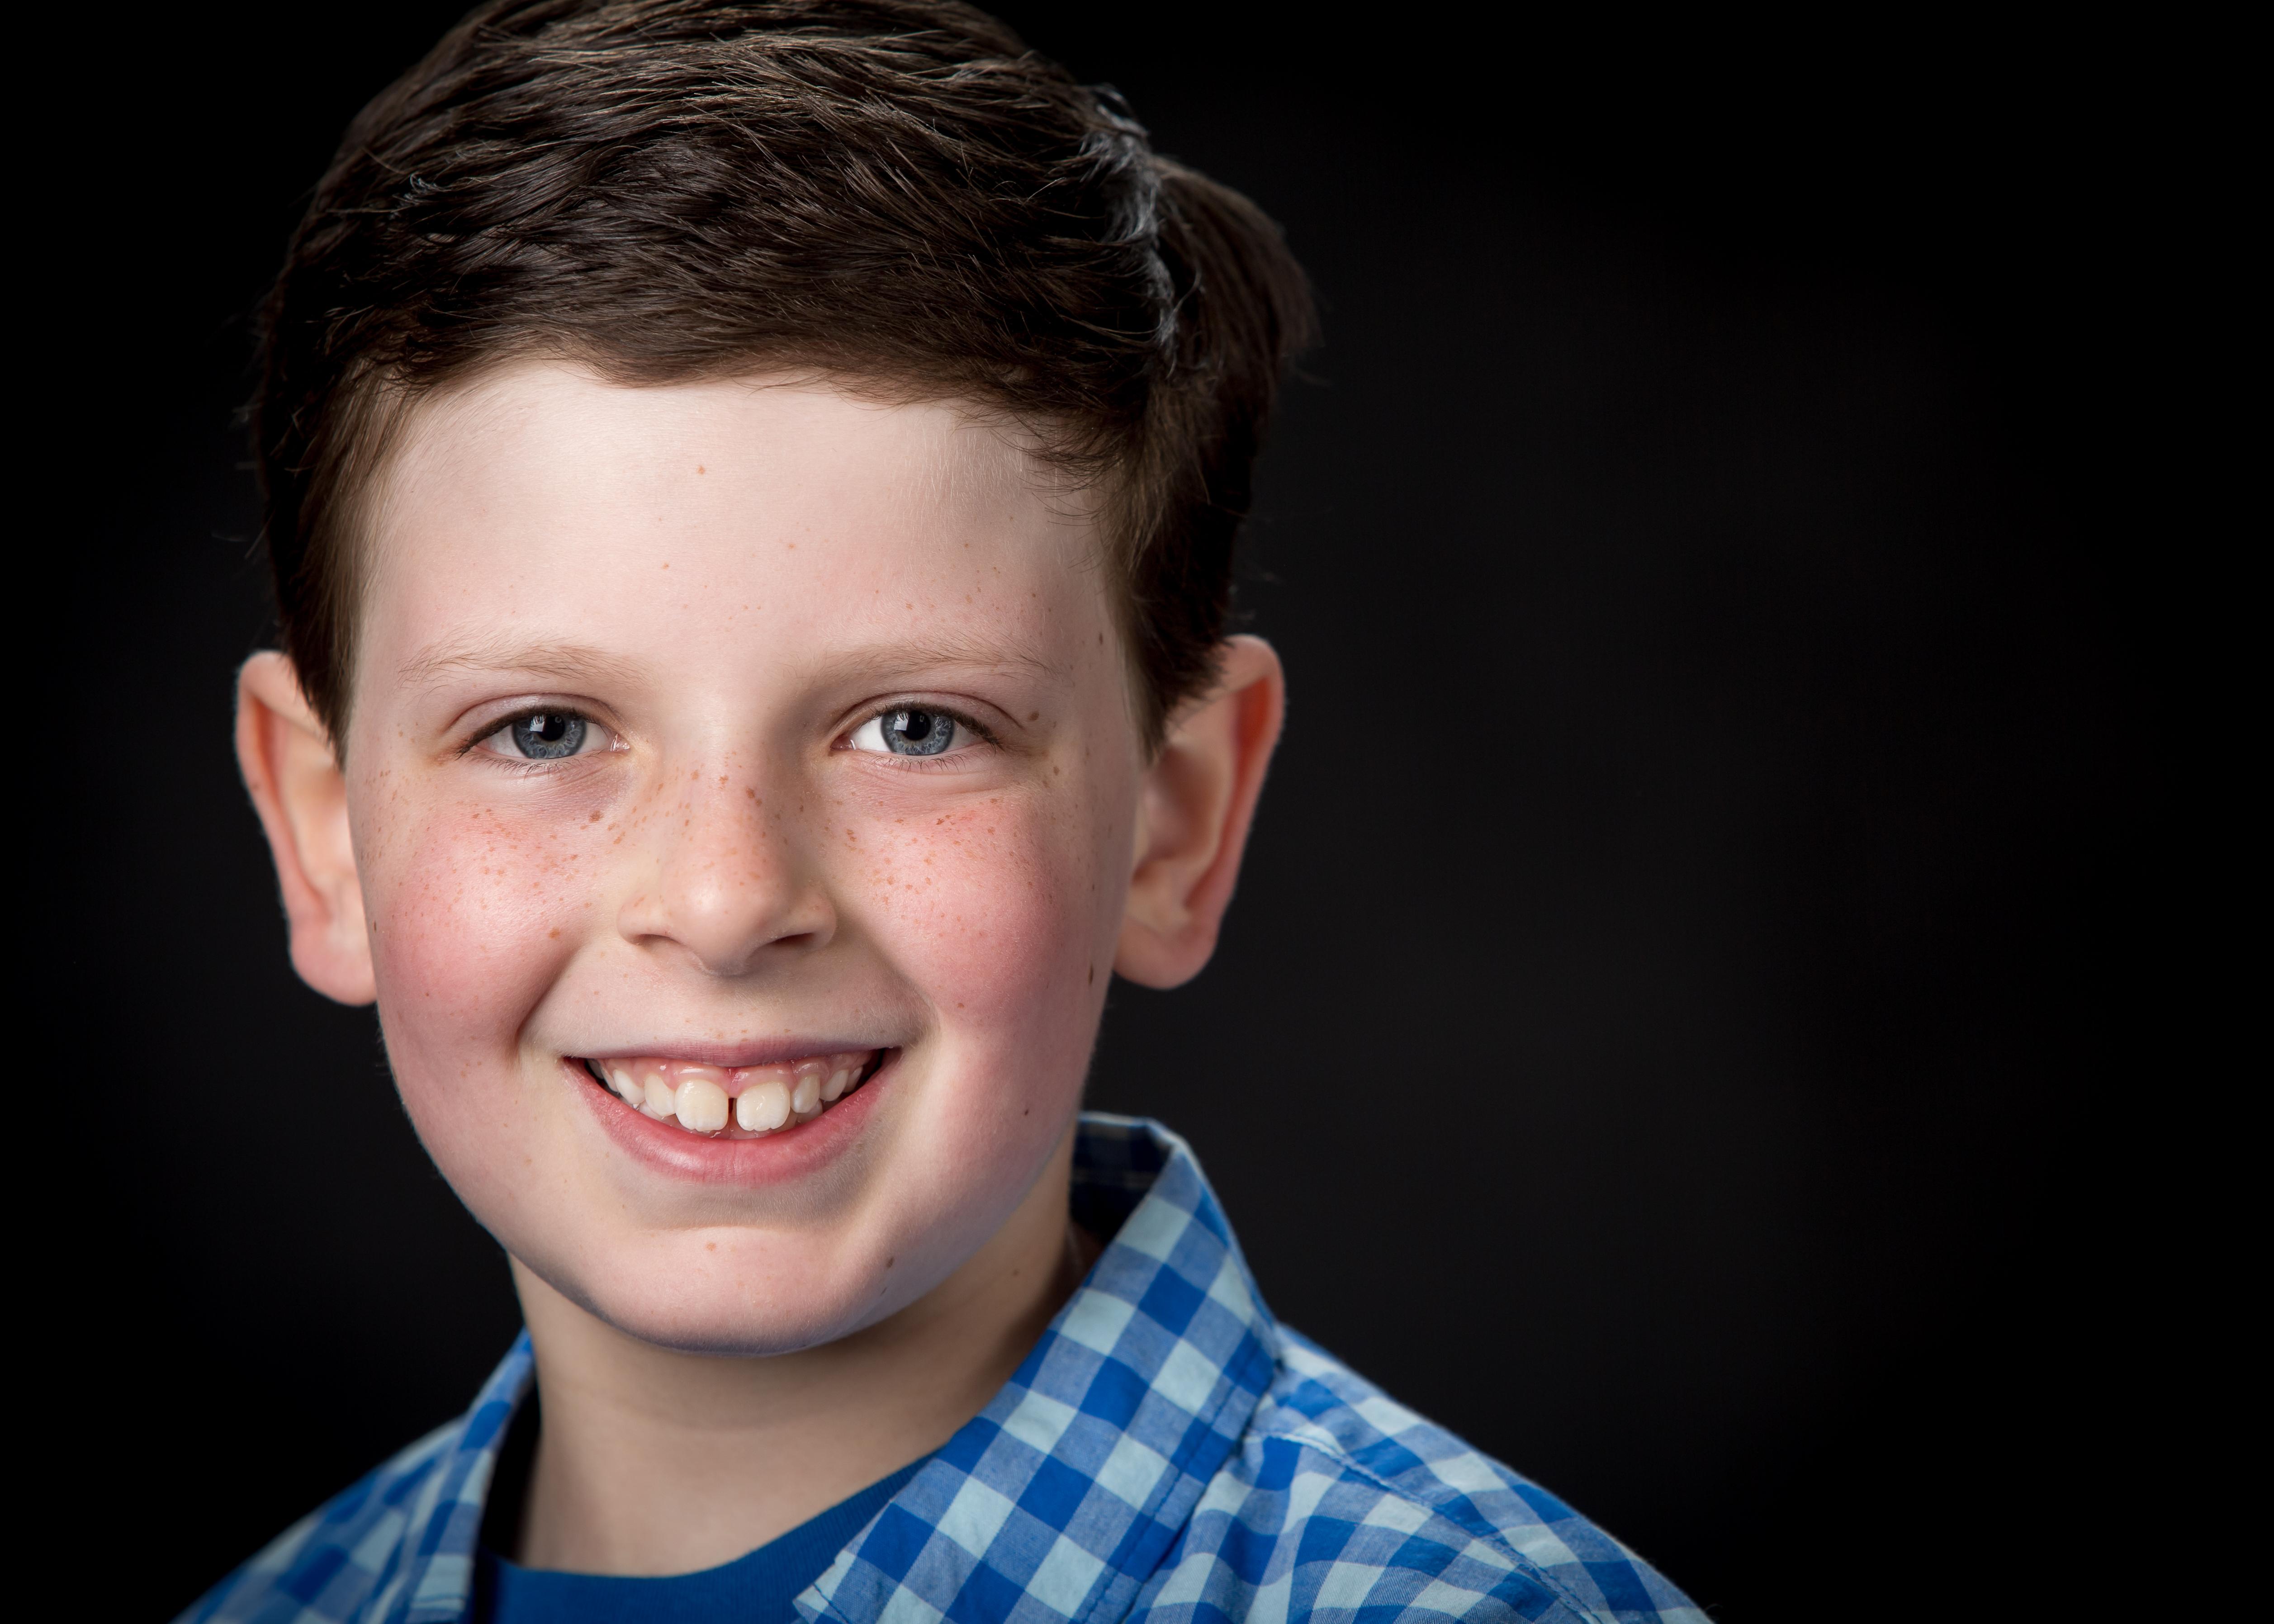 Child Actors Headshot